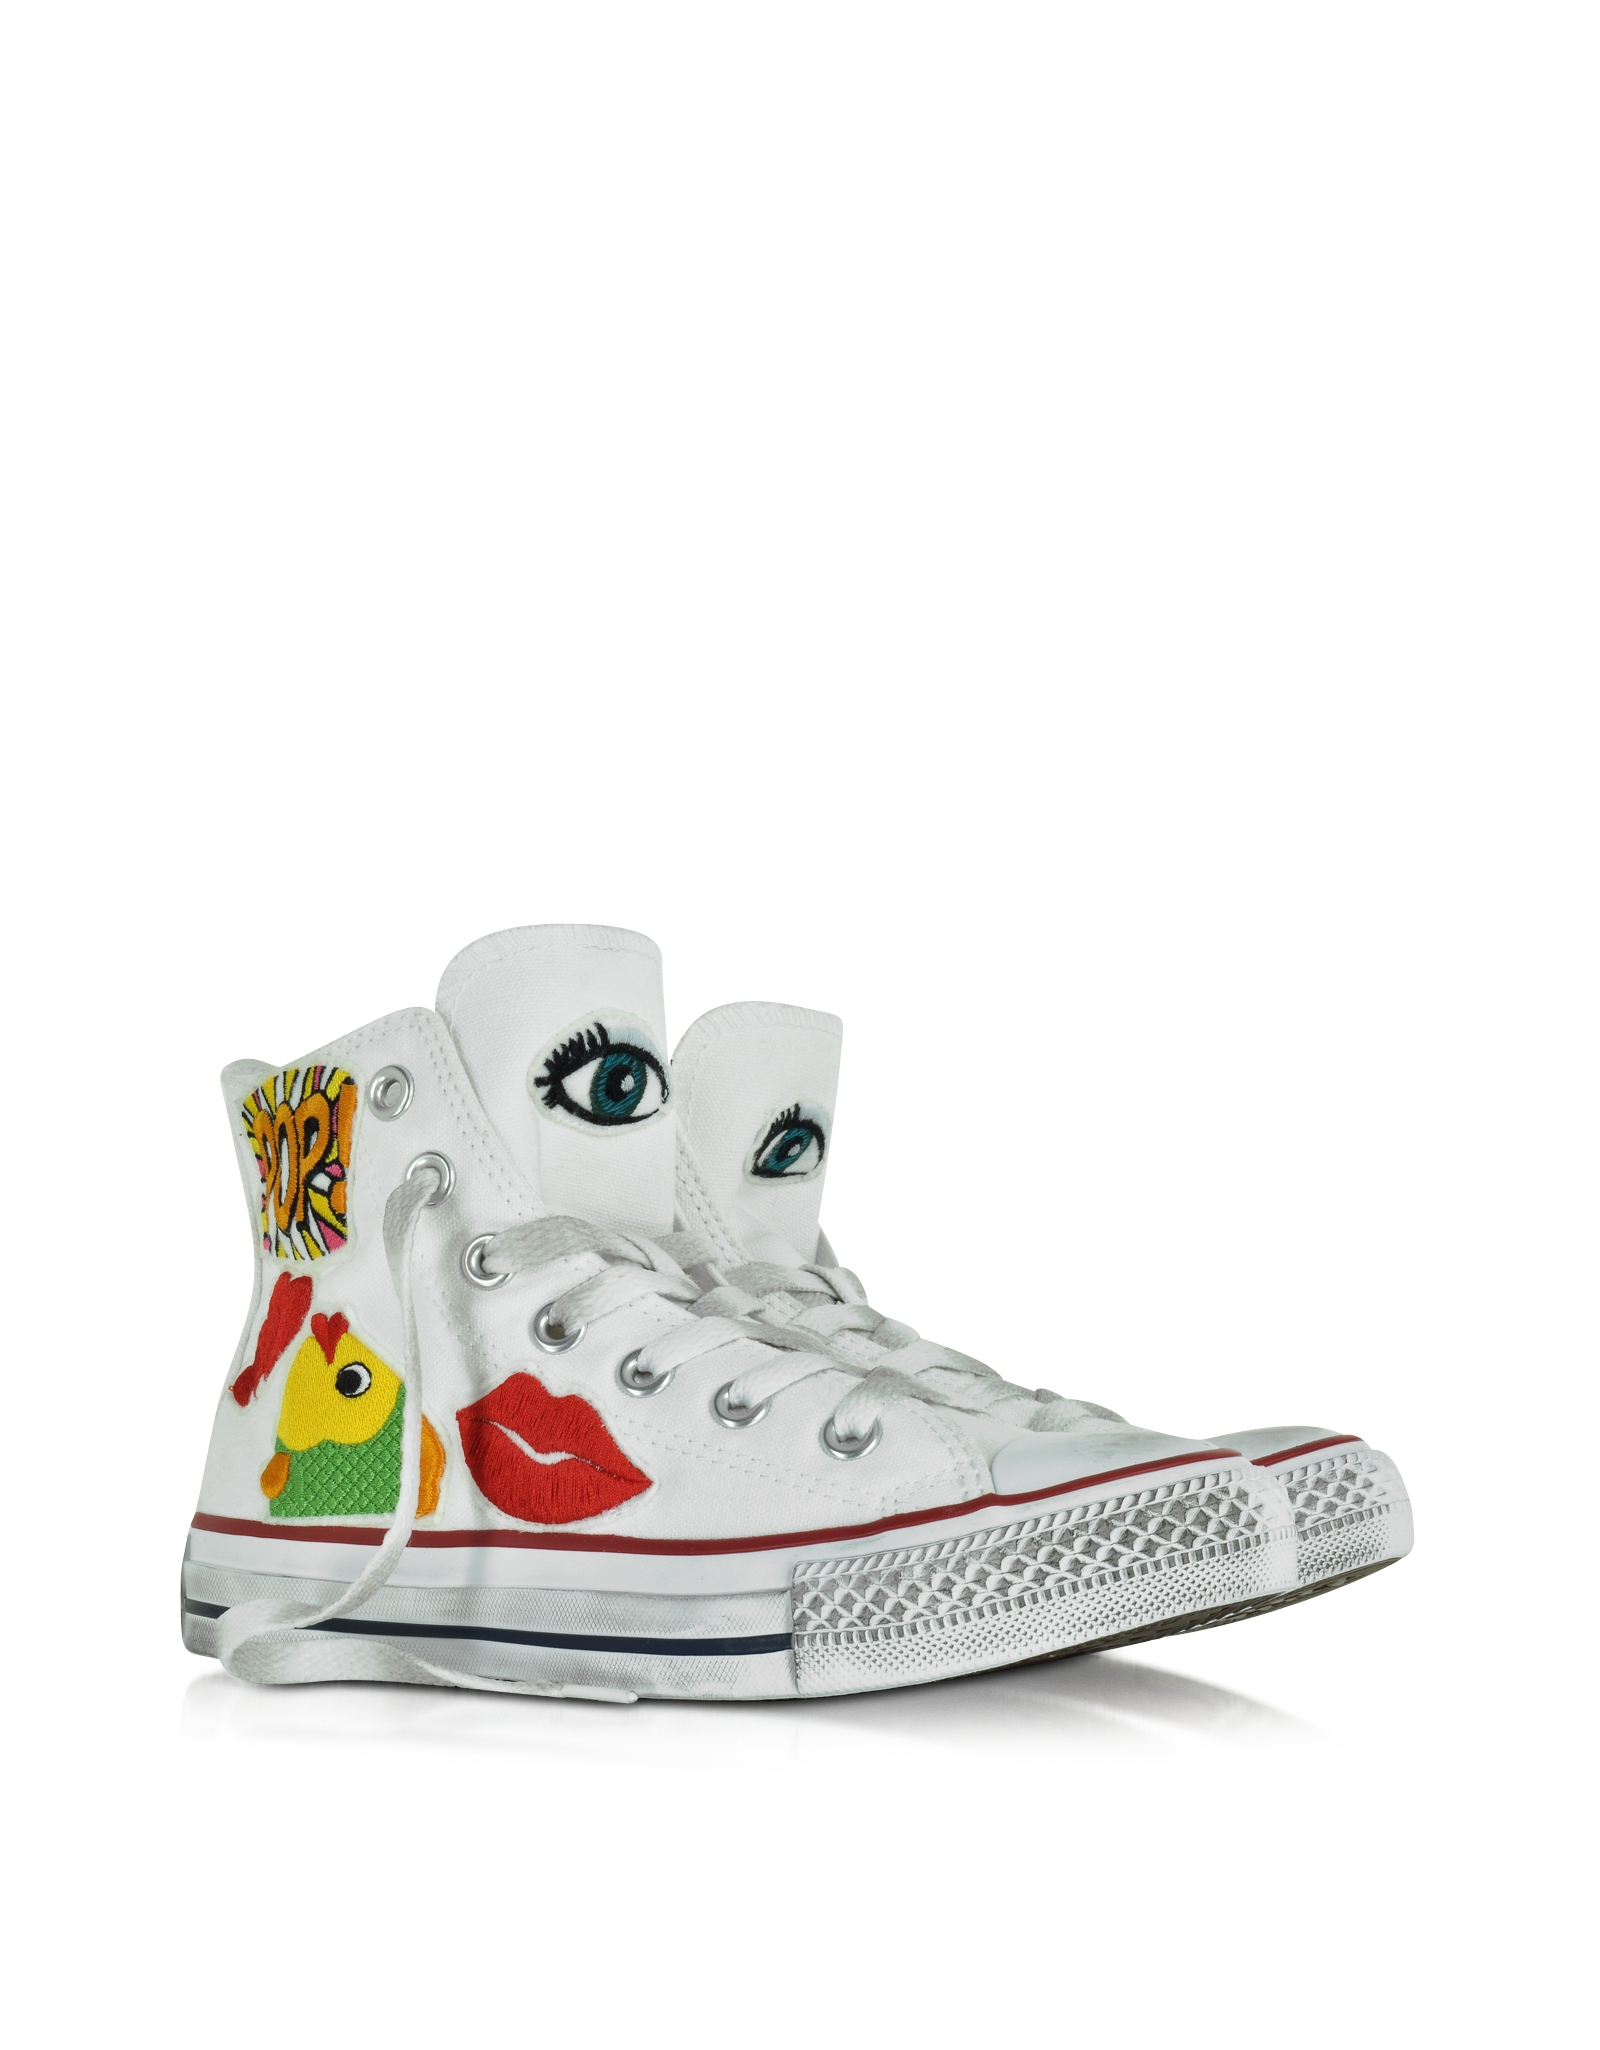 converse all hi white canvas ltd pop s sneaker